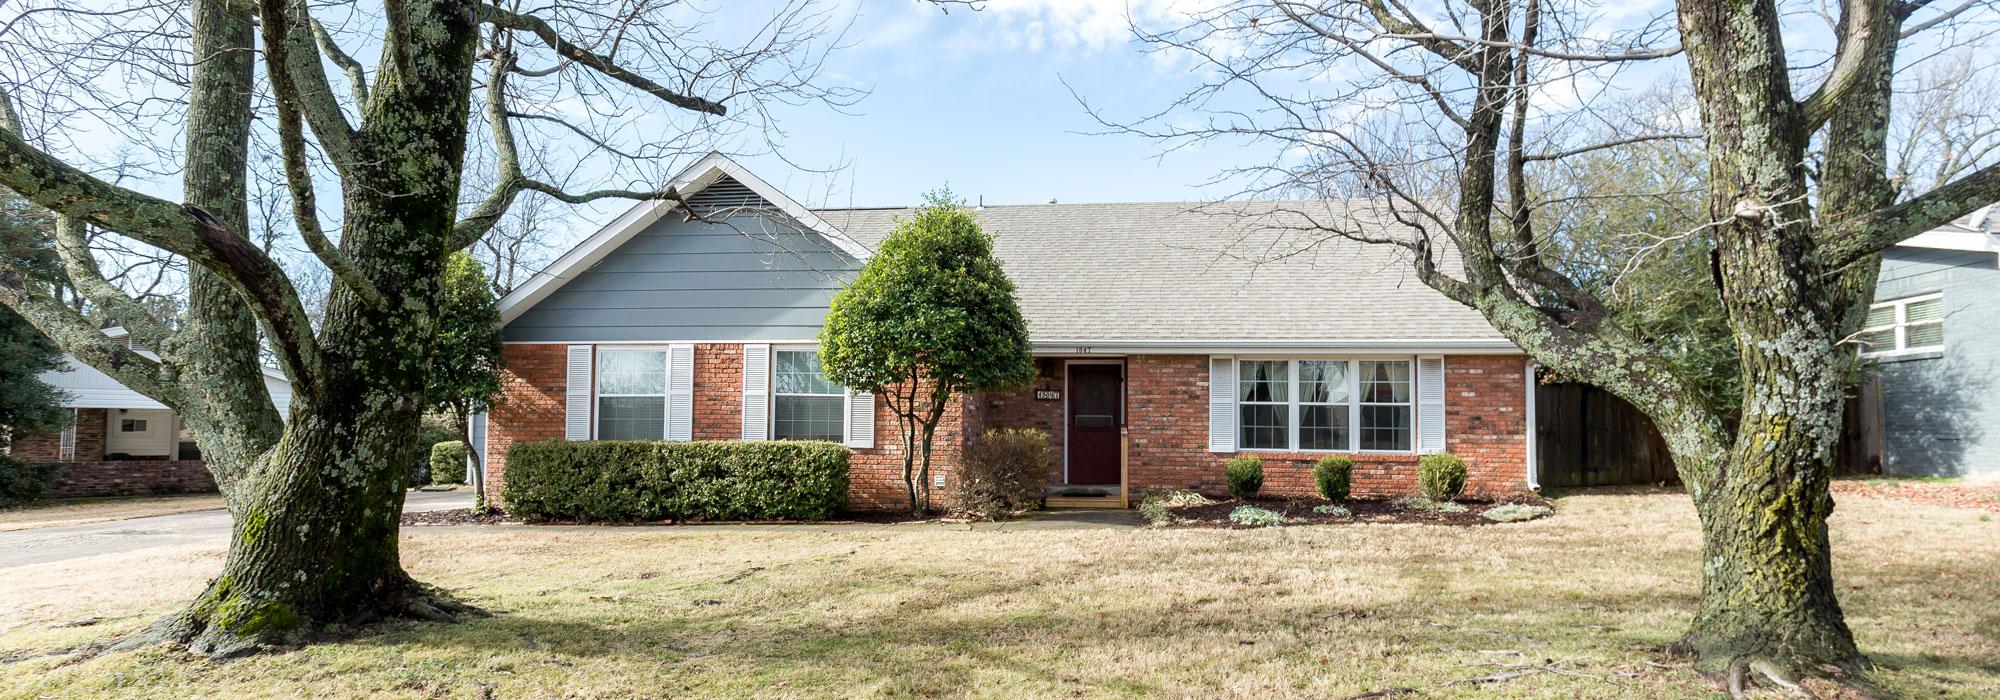 1847 N Wheeler Ave, Fayetteville, AR 72703